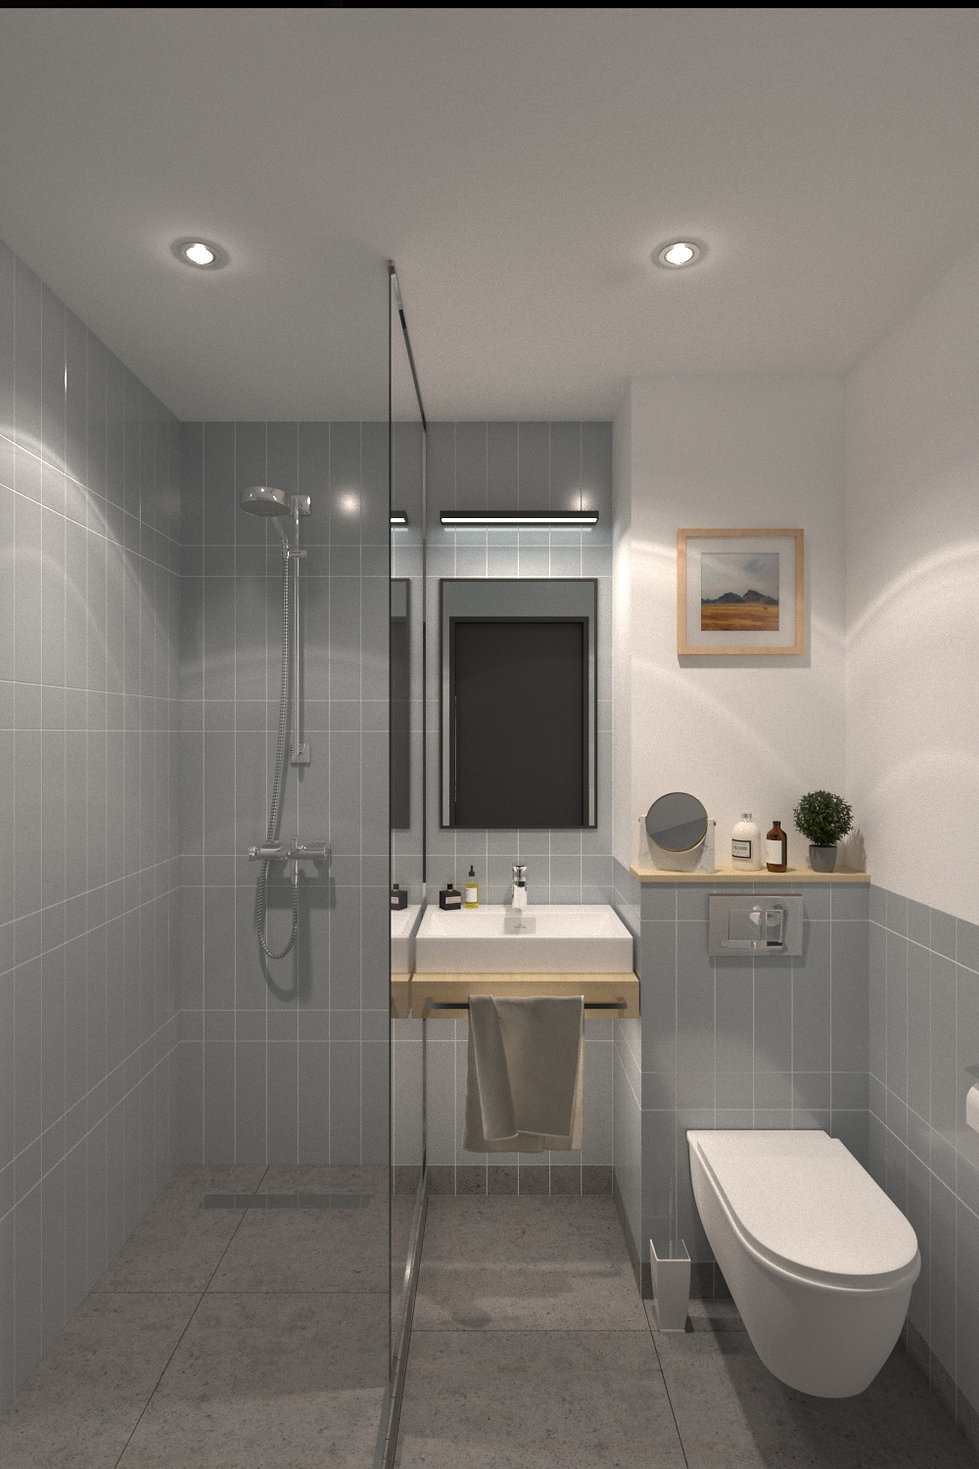 2 camera wc.jpg